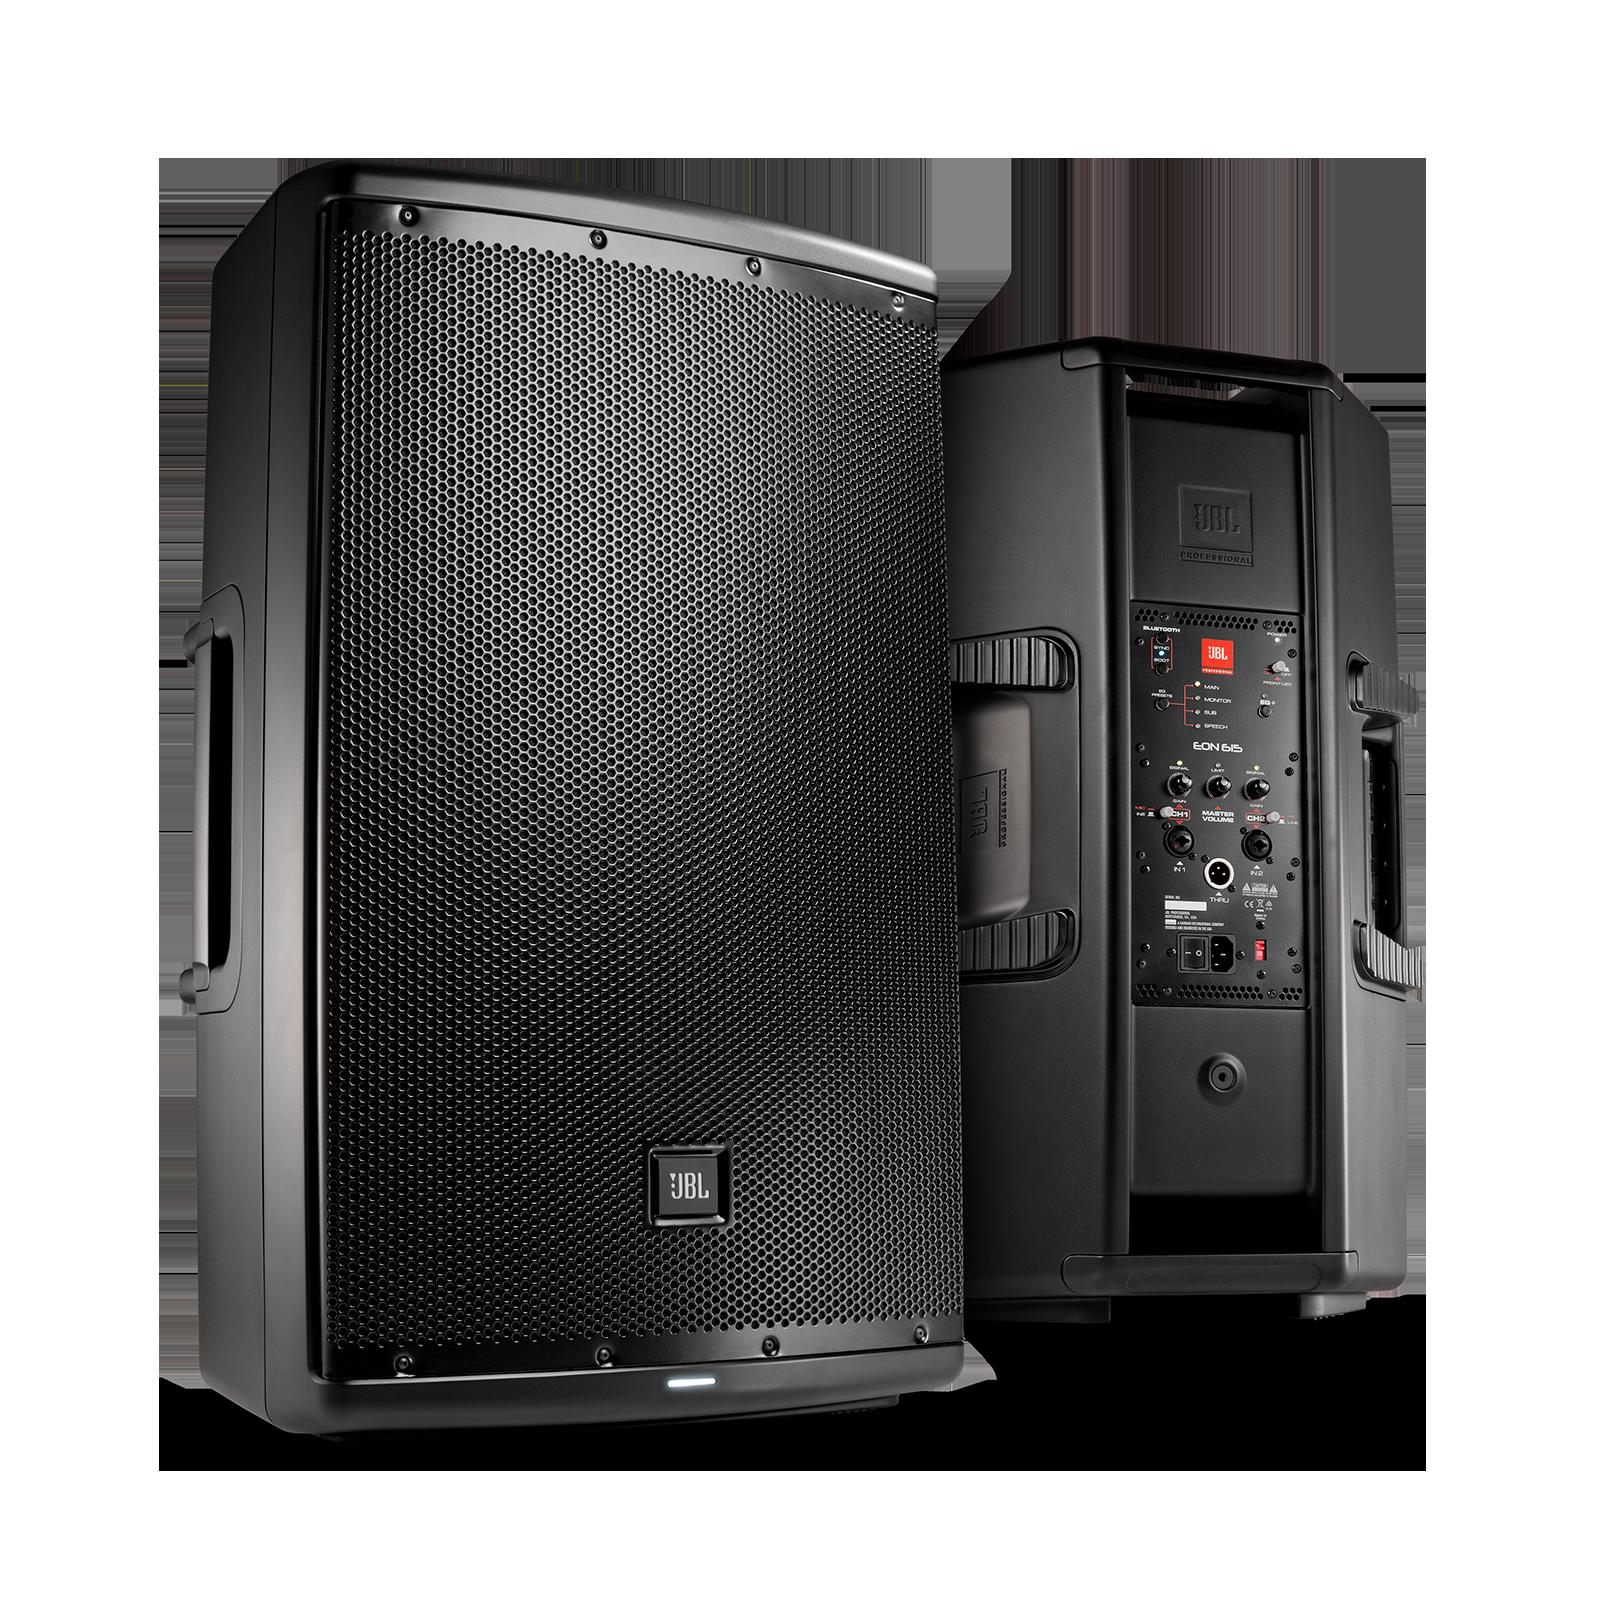 "JBL EON615 - Black - 15"" (38 cm) Two-Way Multipurpose Self-Powered Sound Reinforcement - Hero"